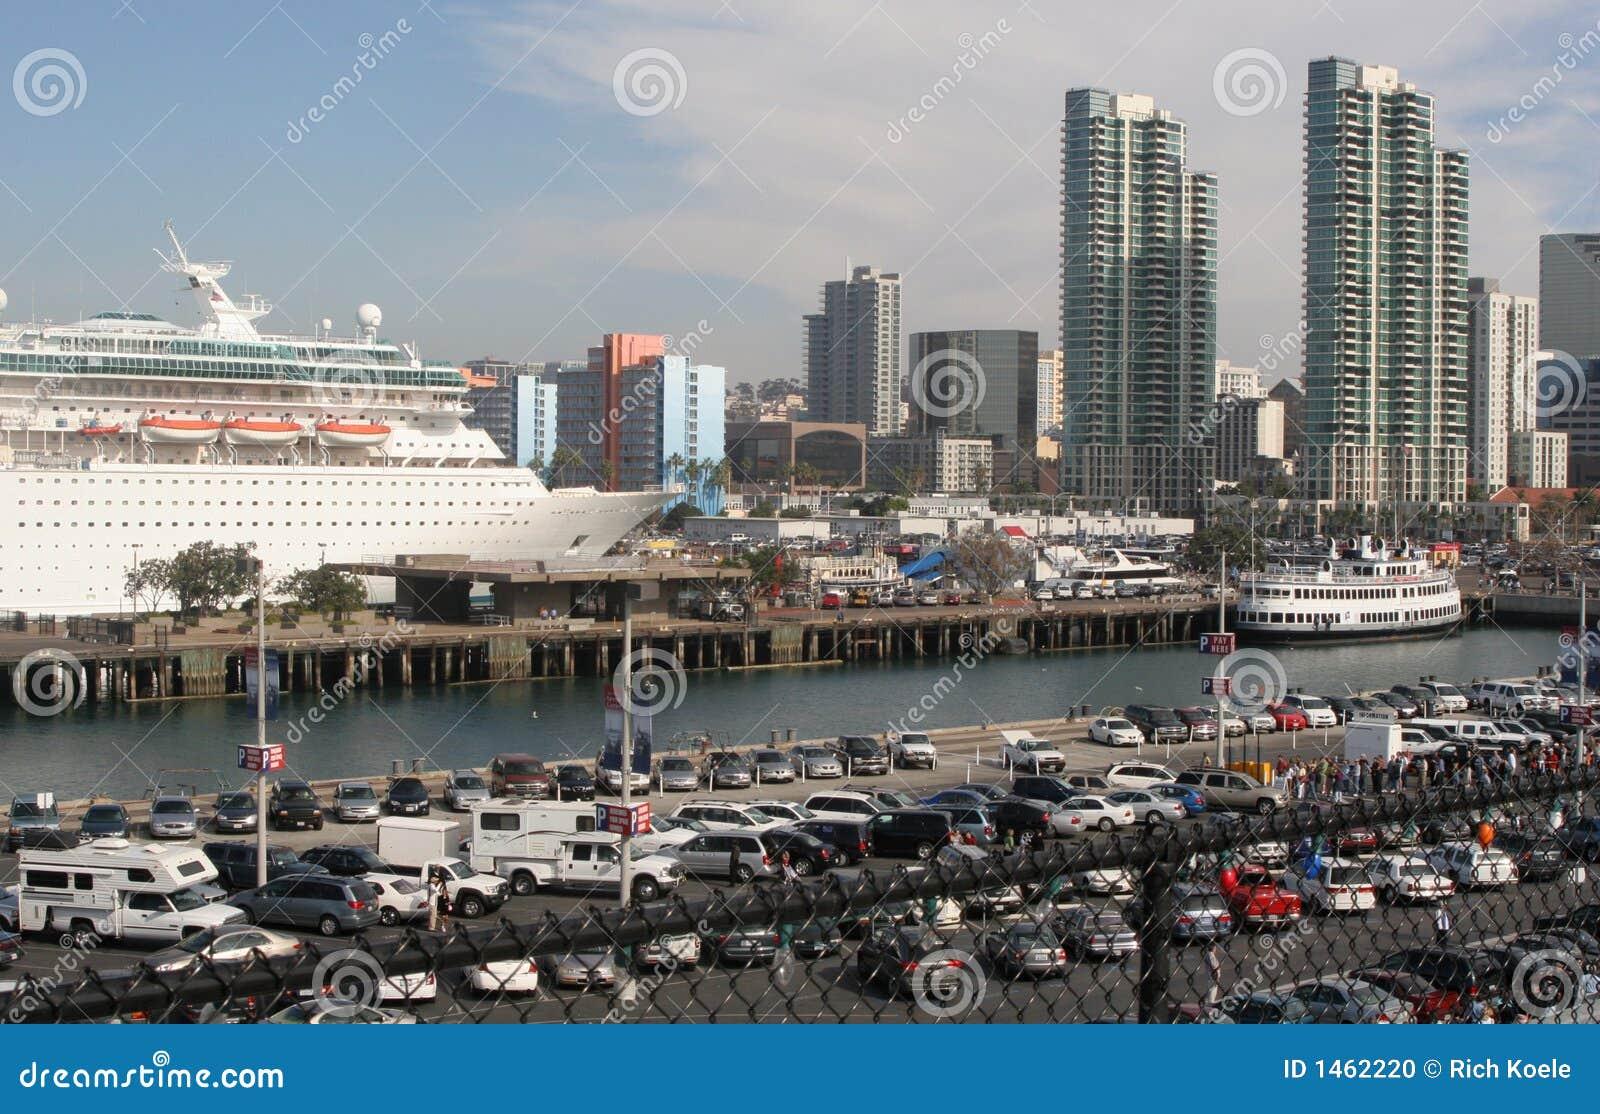 Cruise Ship California Fitbudha Com